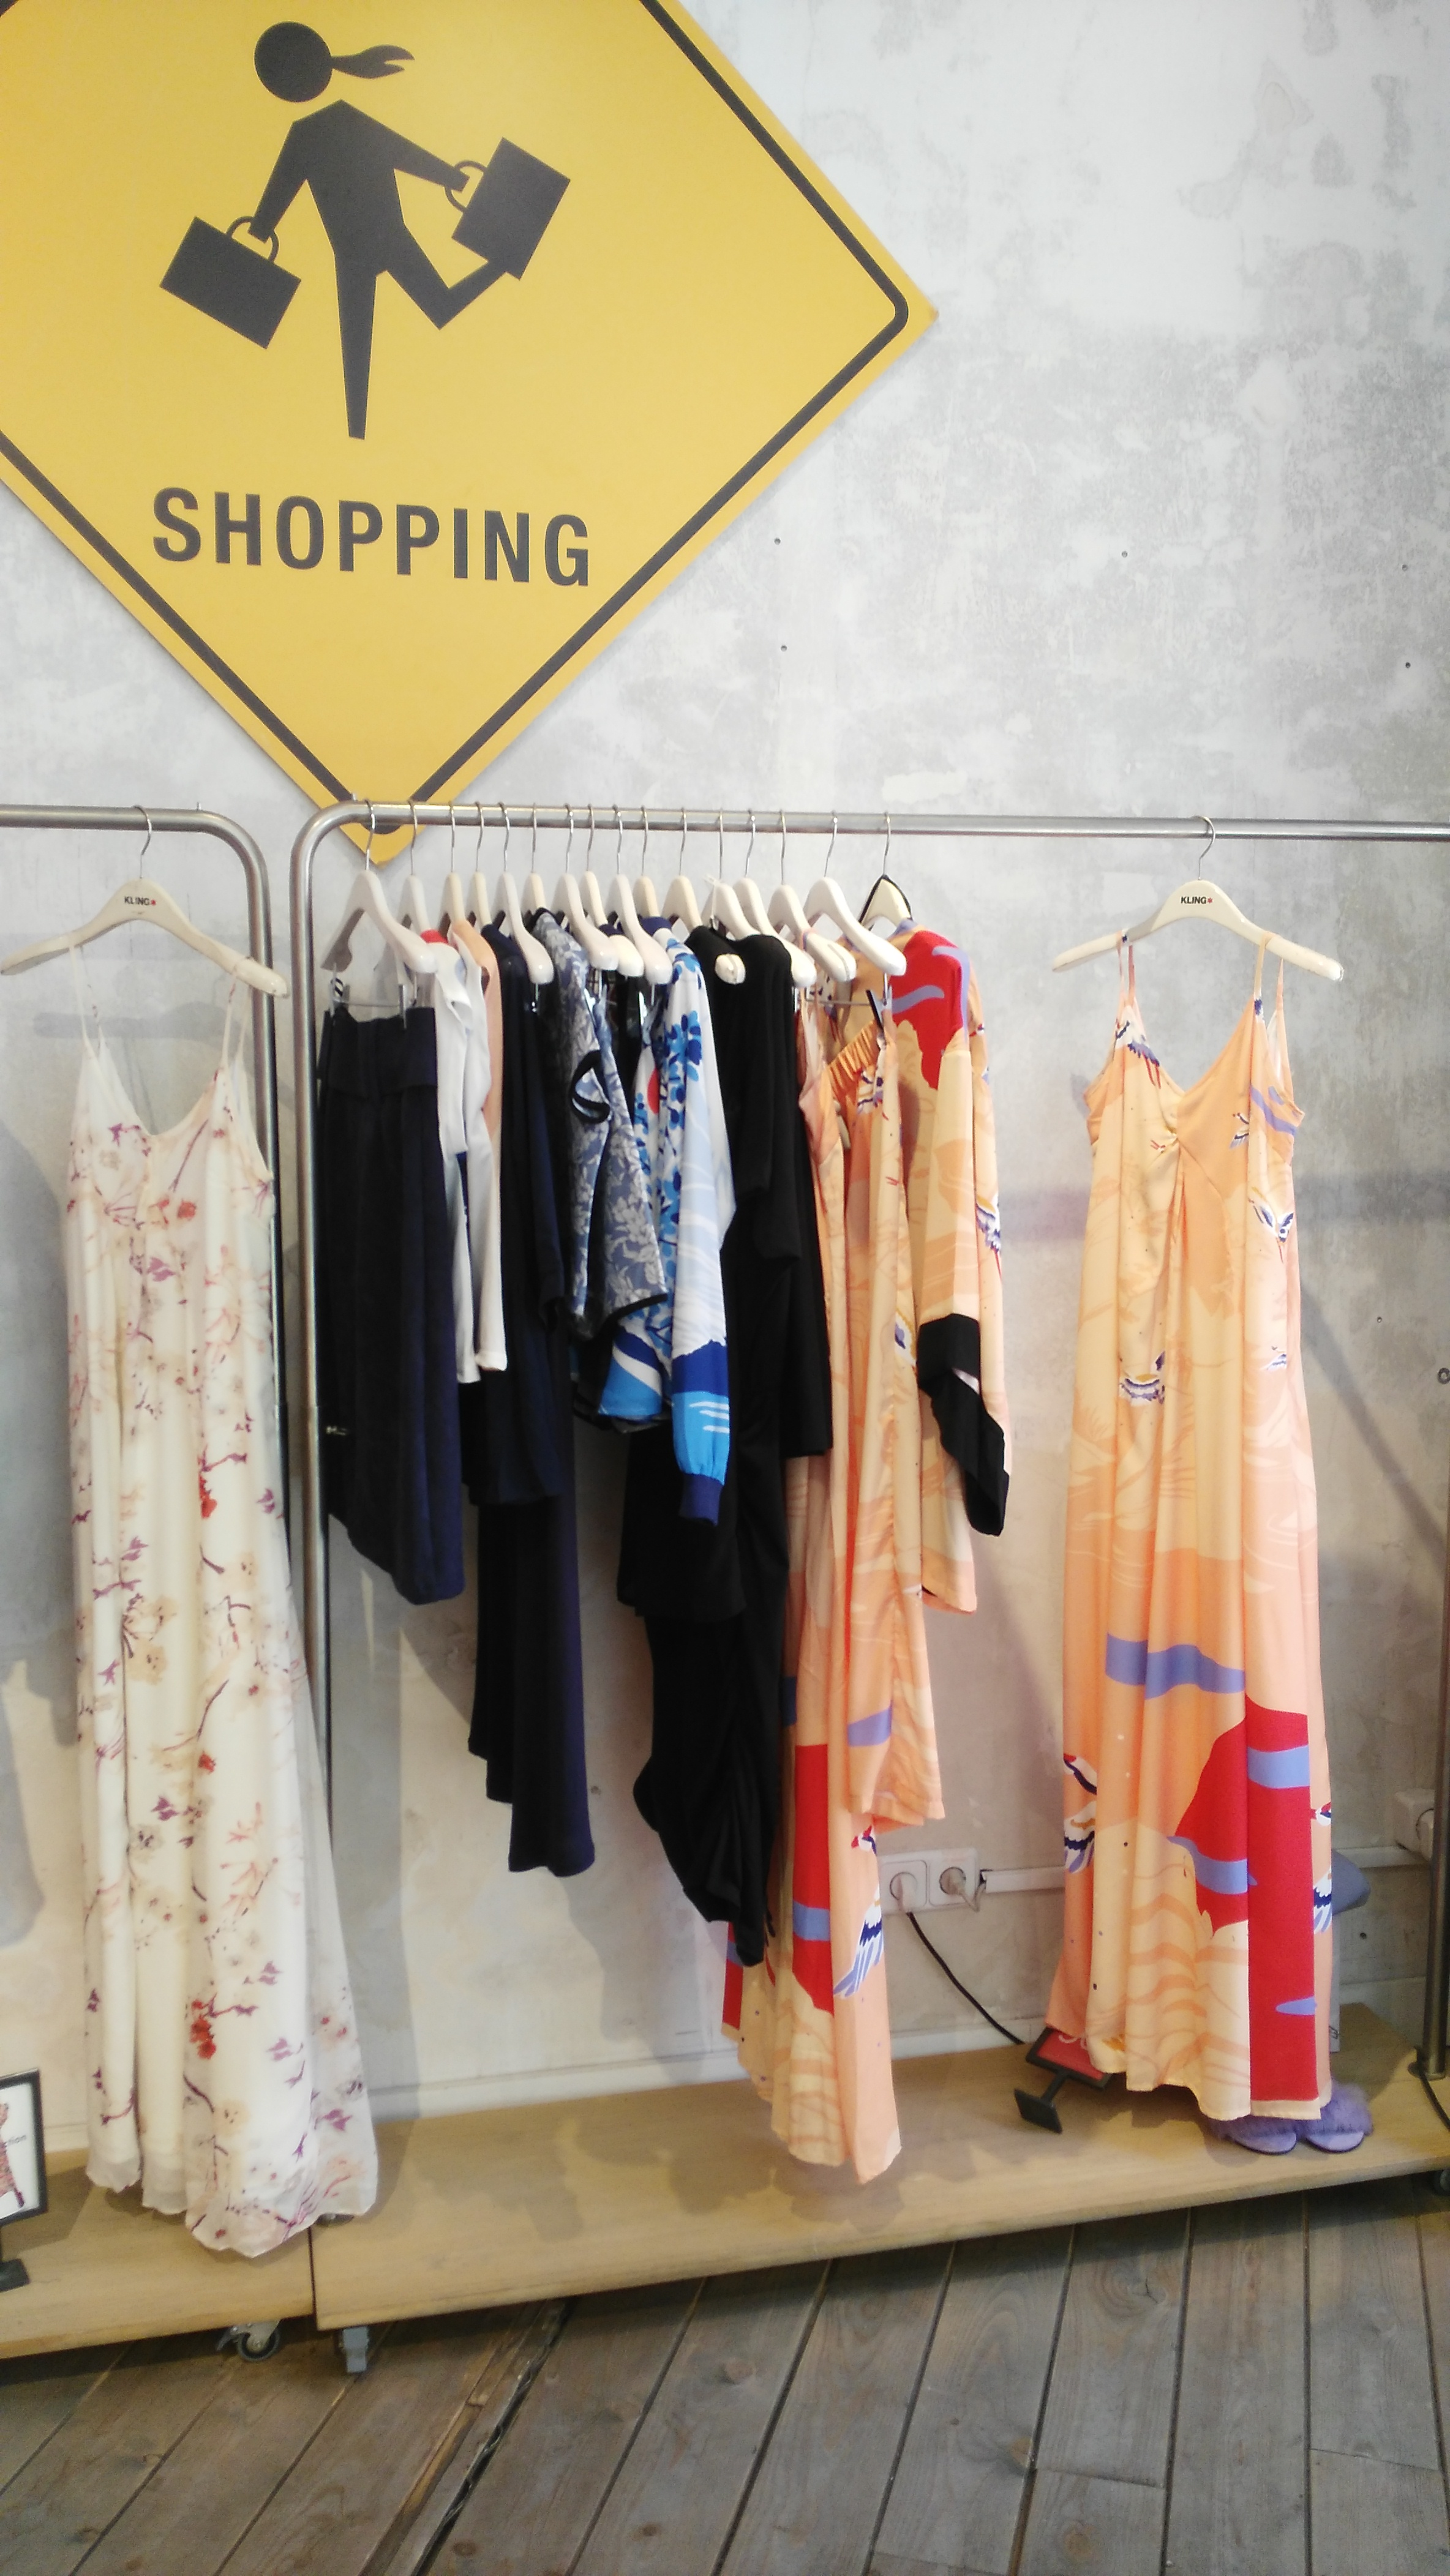 tiendas-ropa-madrid-originales-kling-vestidos.jpg